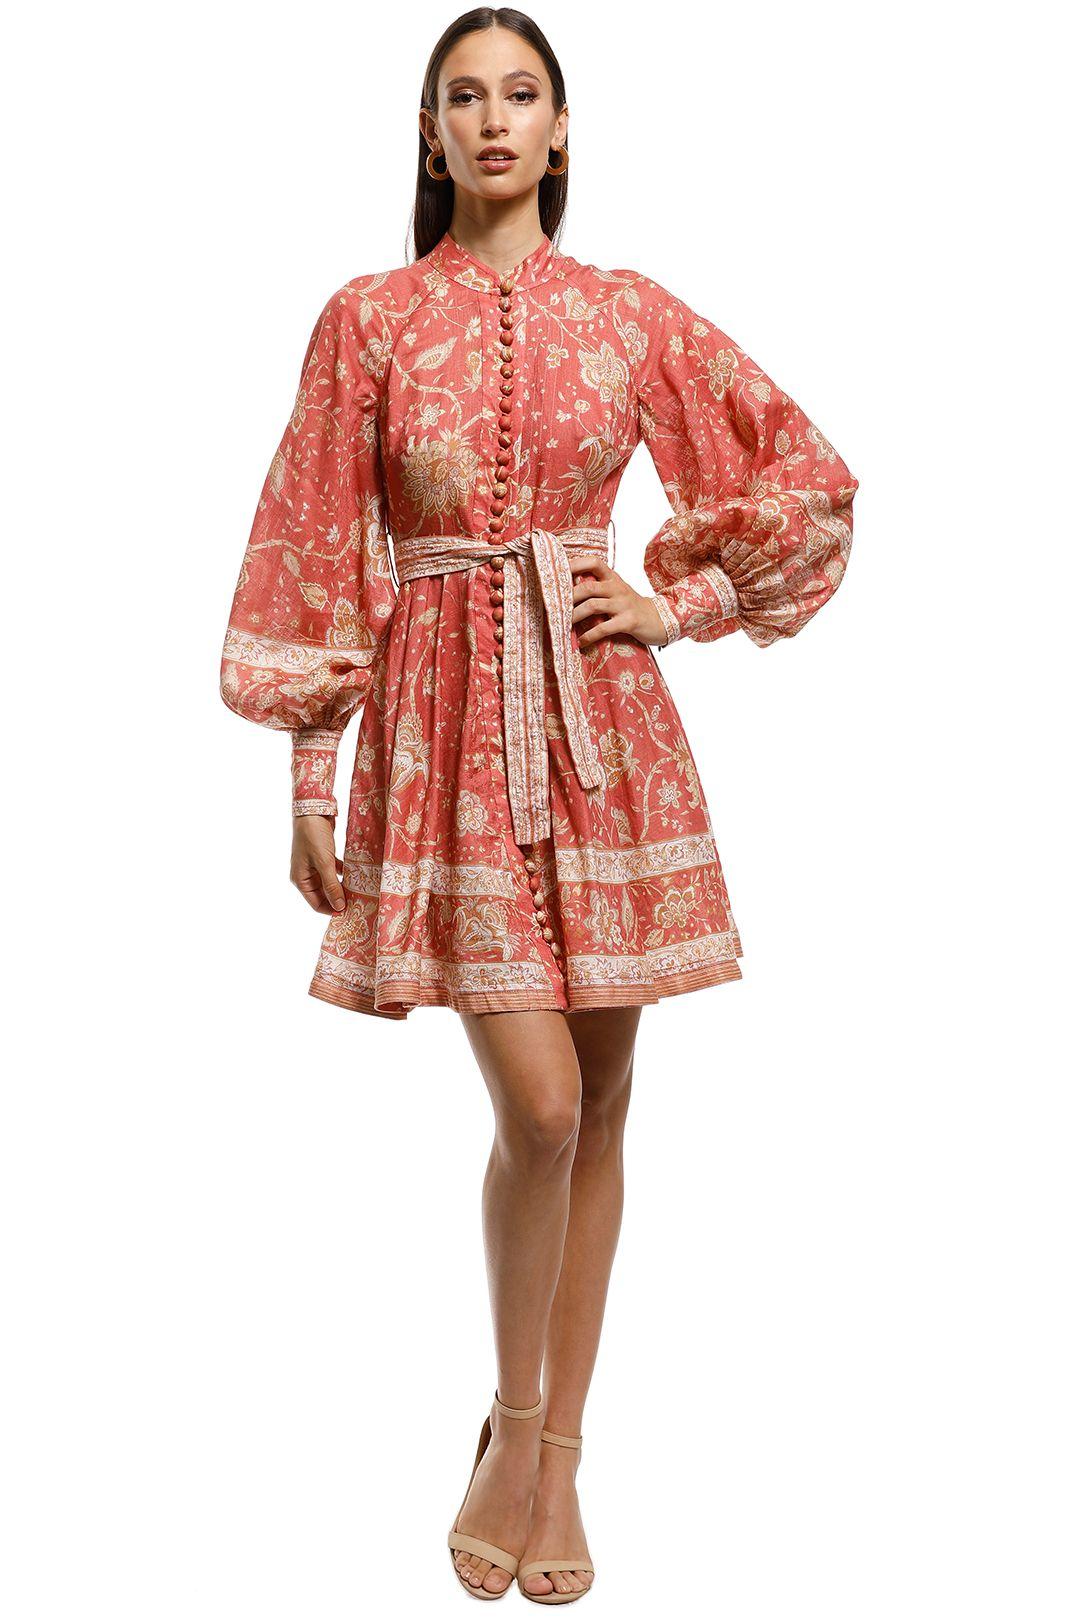 Zimmermann - Veneto Border Short Dress - Pink - Front